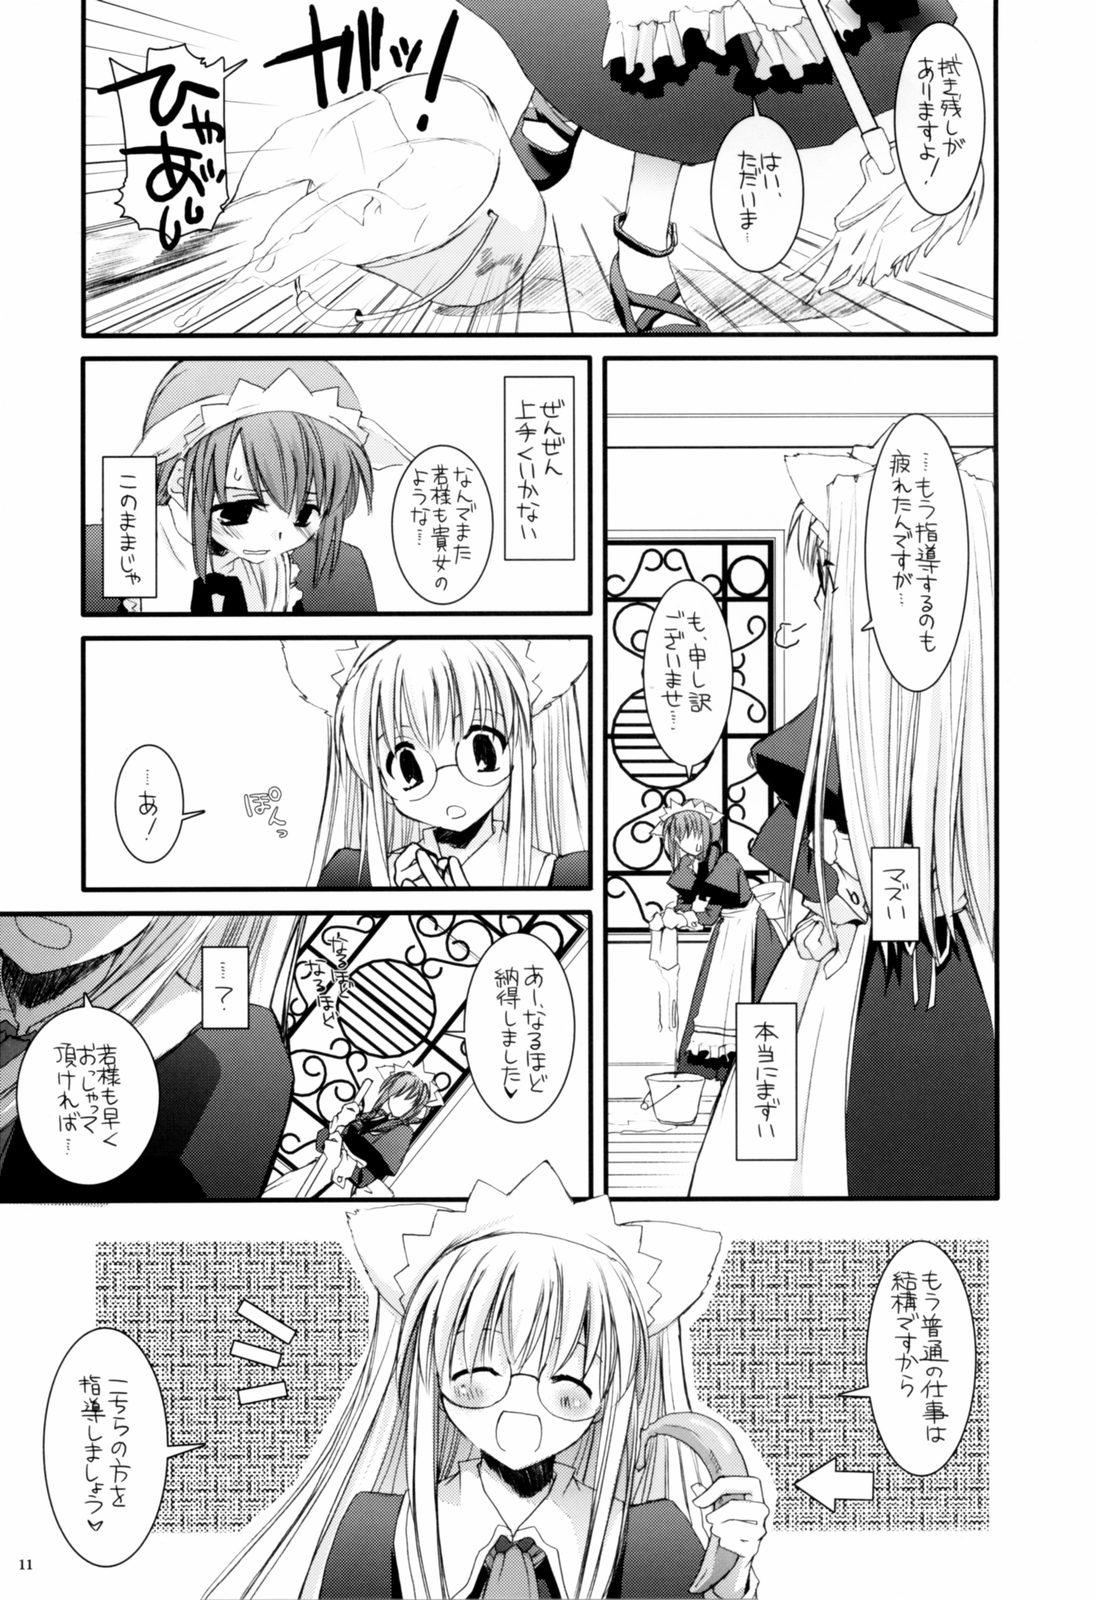 Seifuku Rakuen 13 - Costume Paradise 13 9